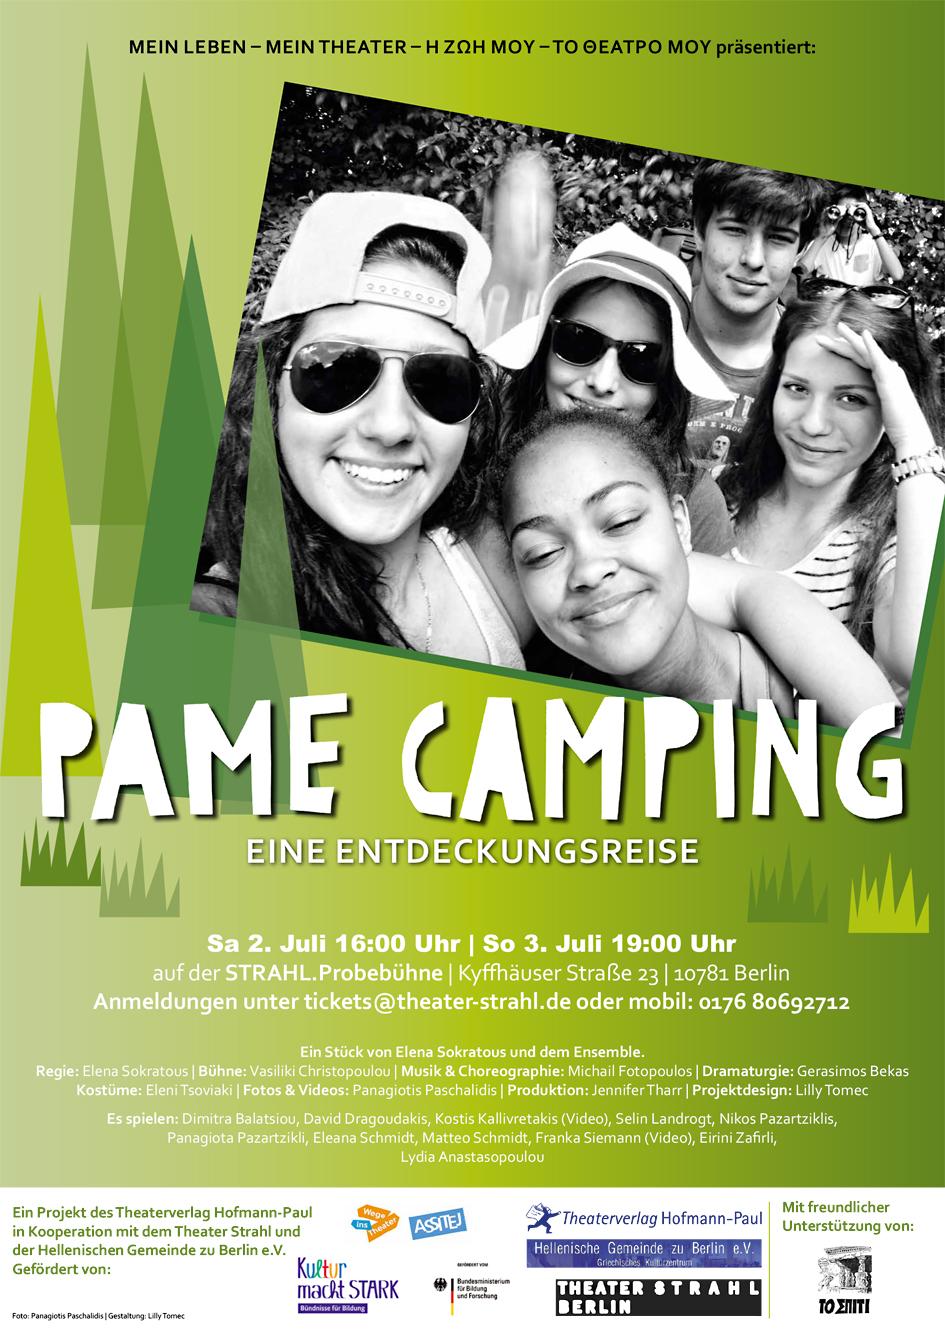 Pame Camping: Eine Entdeckungsreise - poster